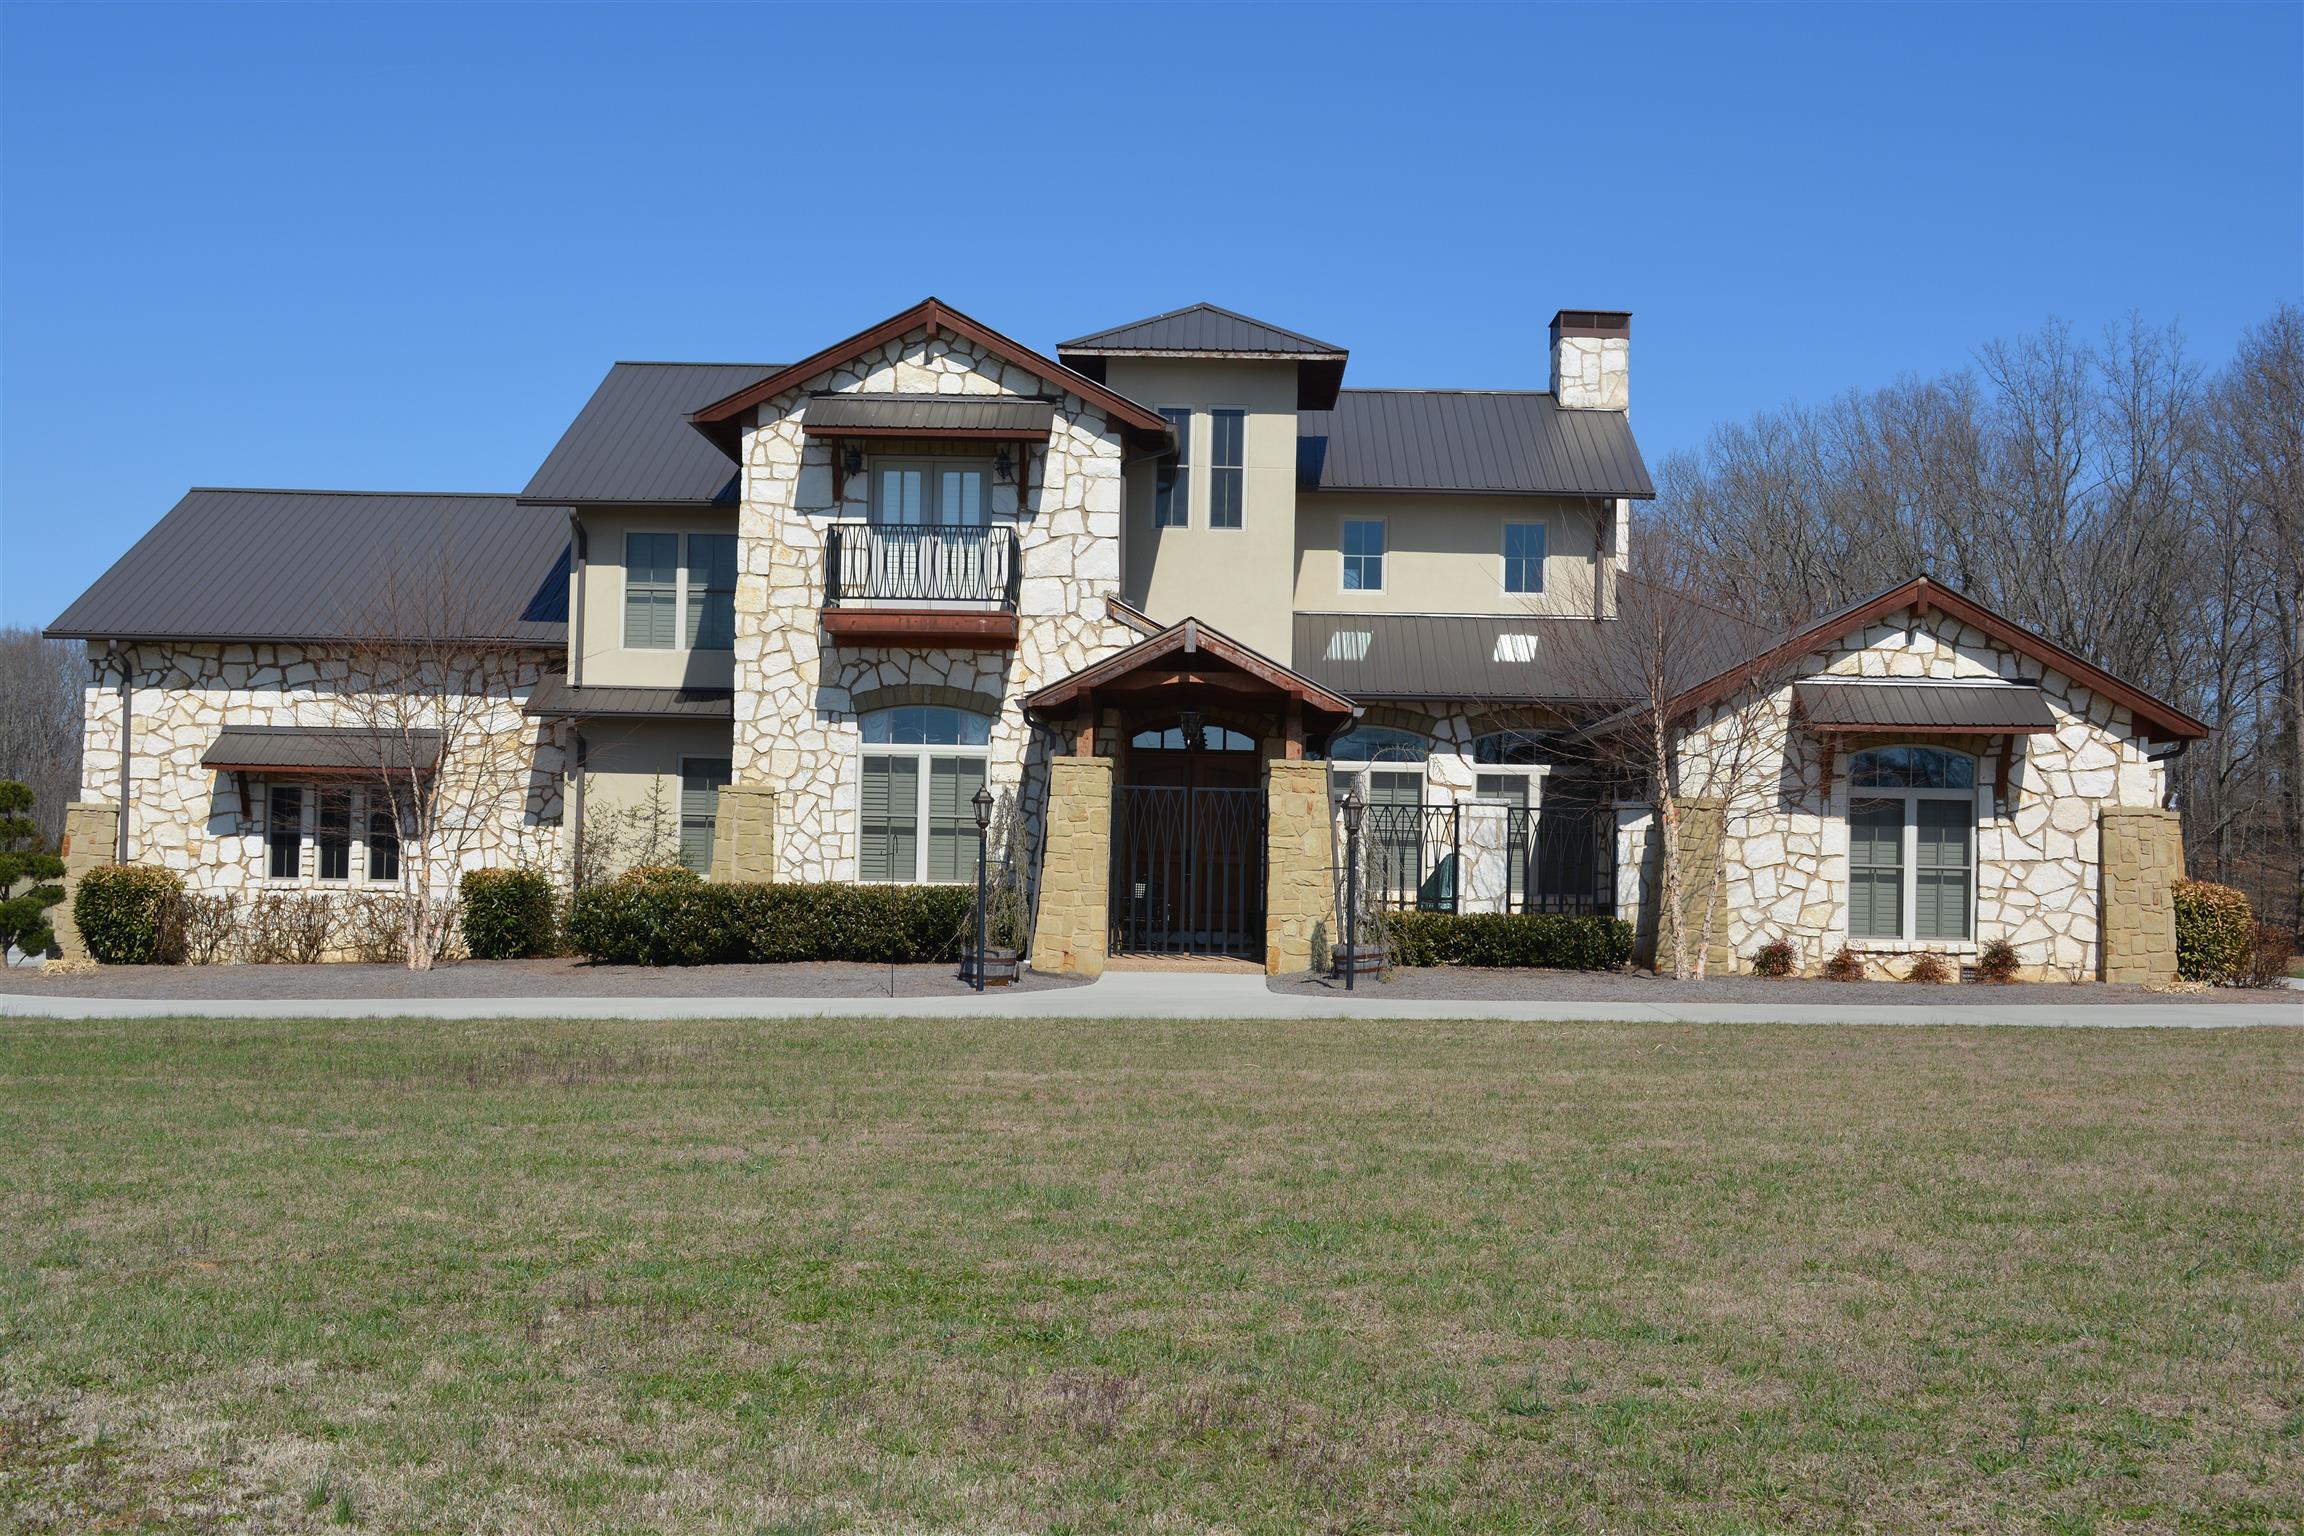 56 Boles Ln, McMinnville, TN 37110 - McMinnville, TN real estate listing